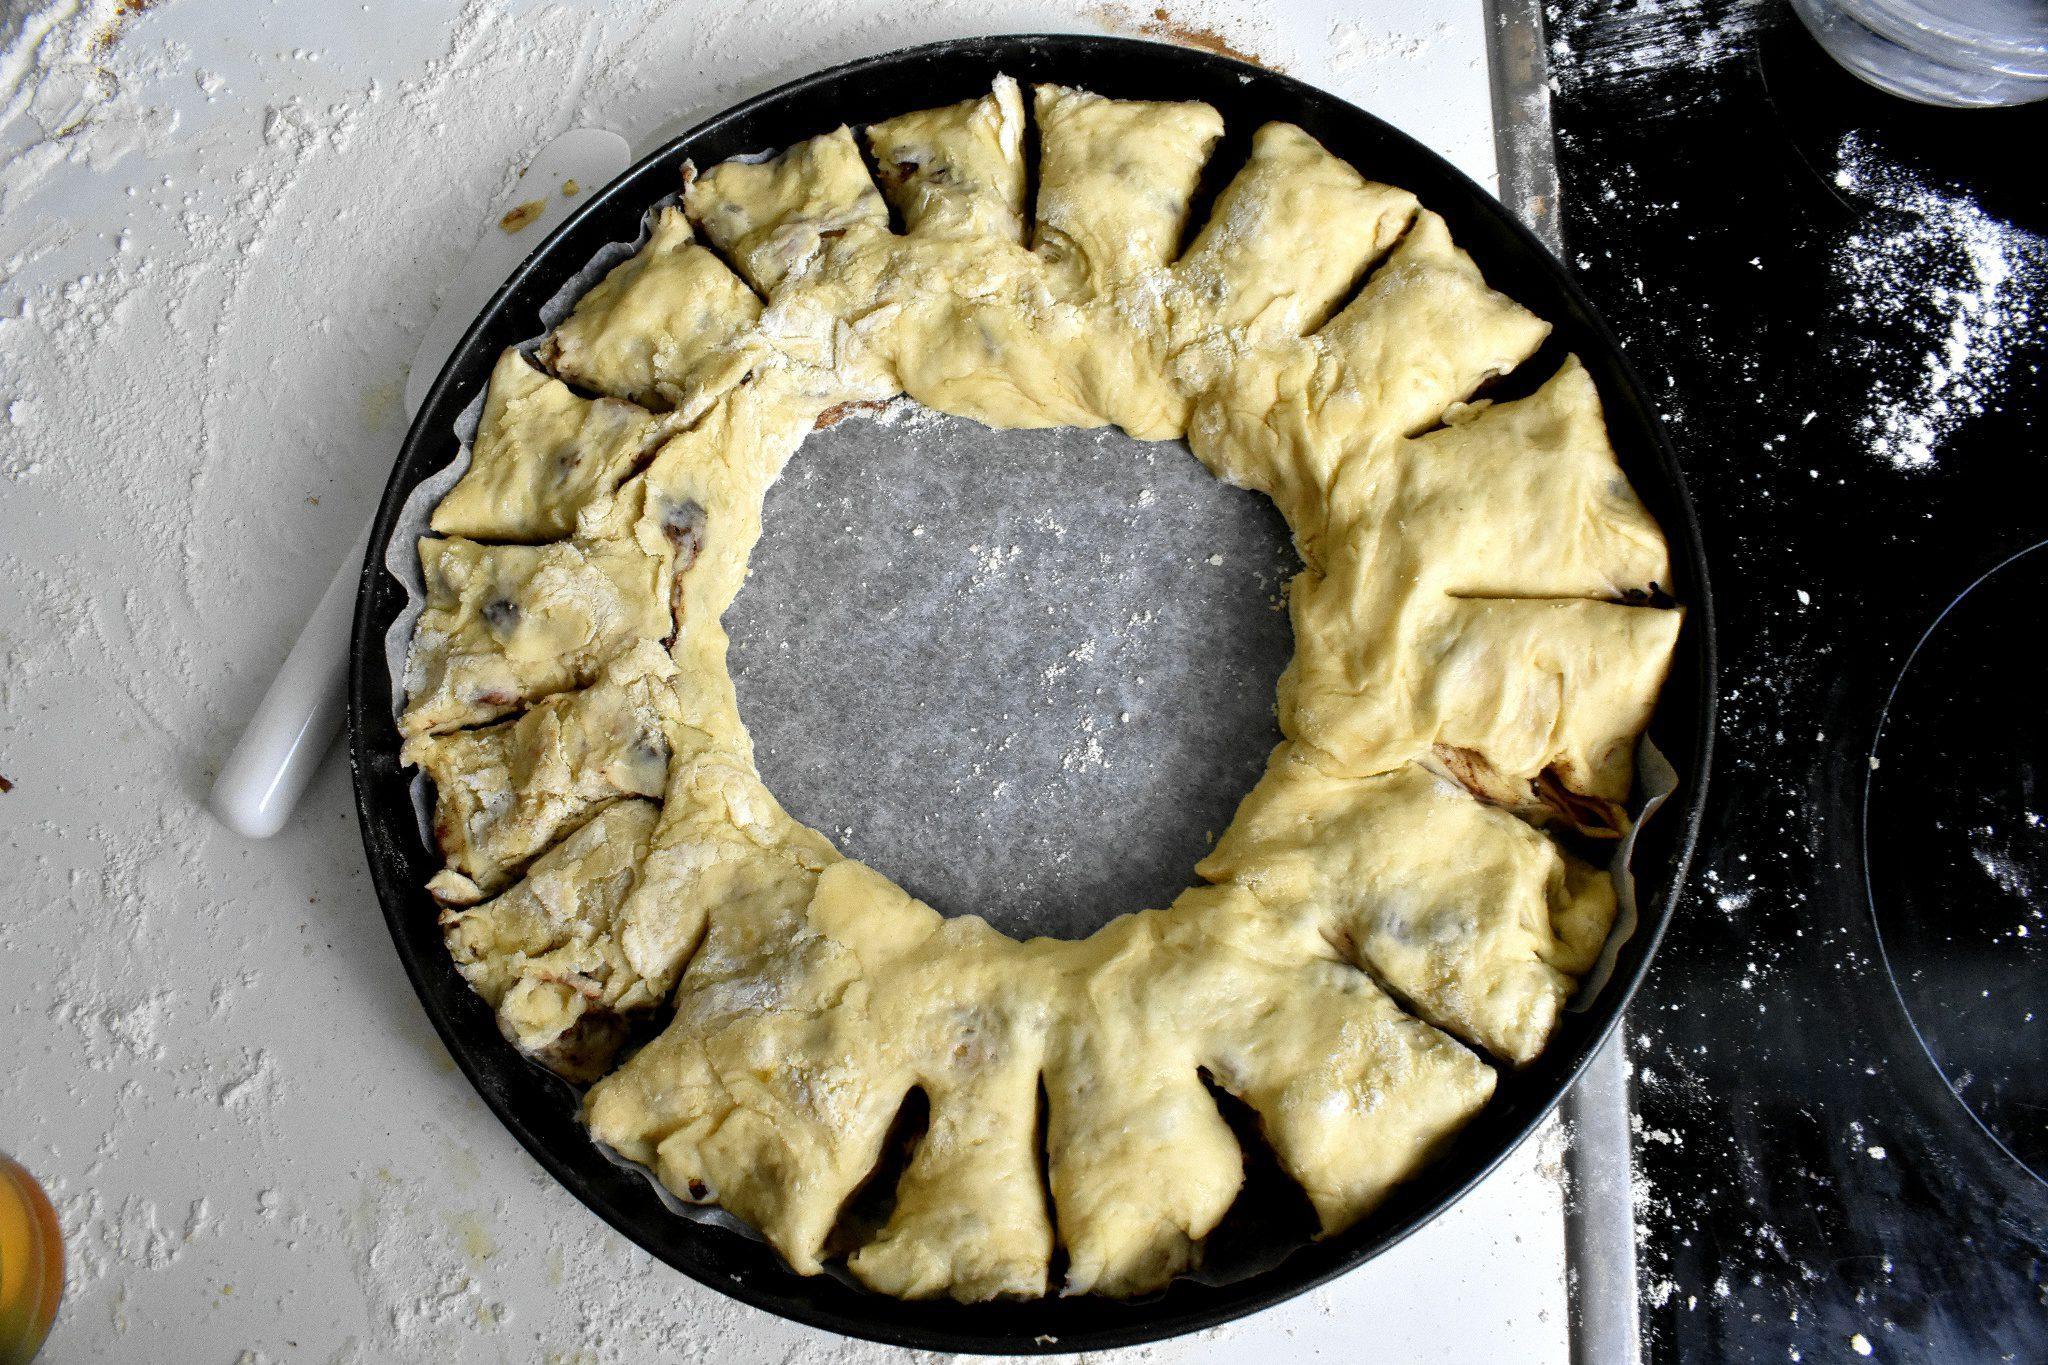 Roscon-de-reyes-King-cake-process-11-SunCakeMom